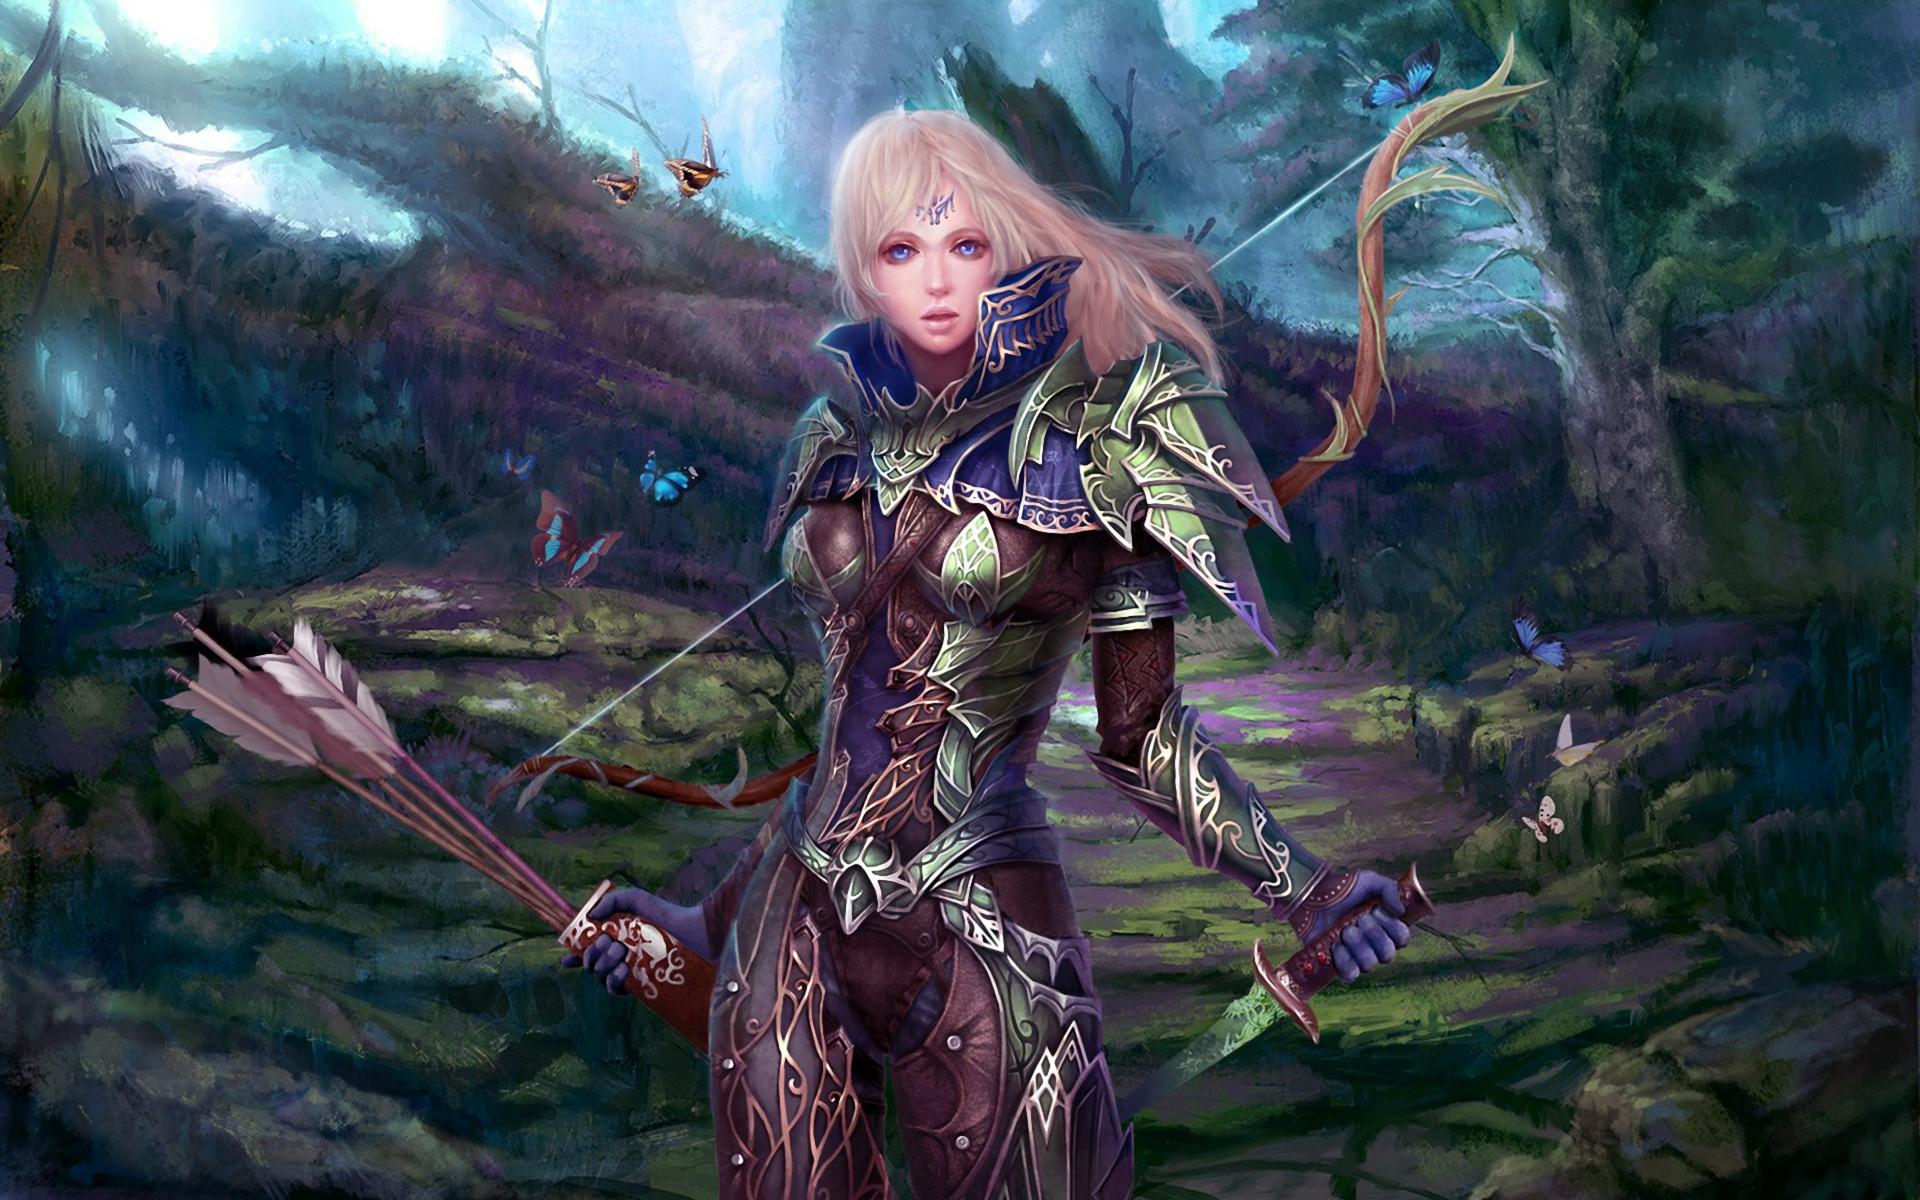 download wallpaper female warrior - photo #2